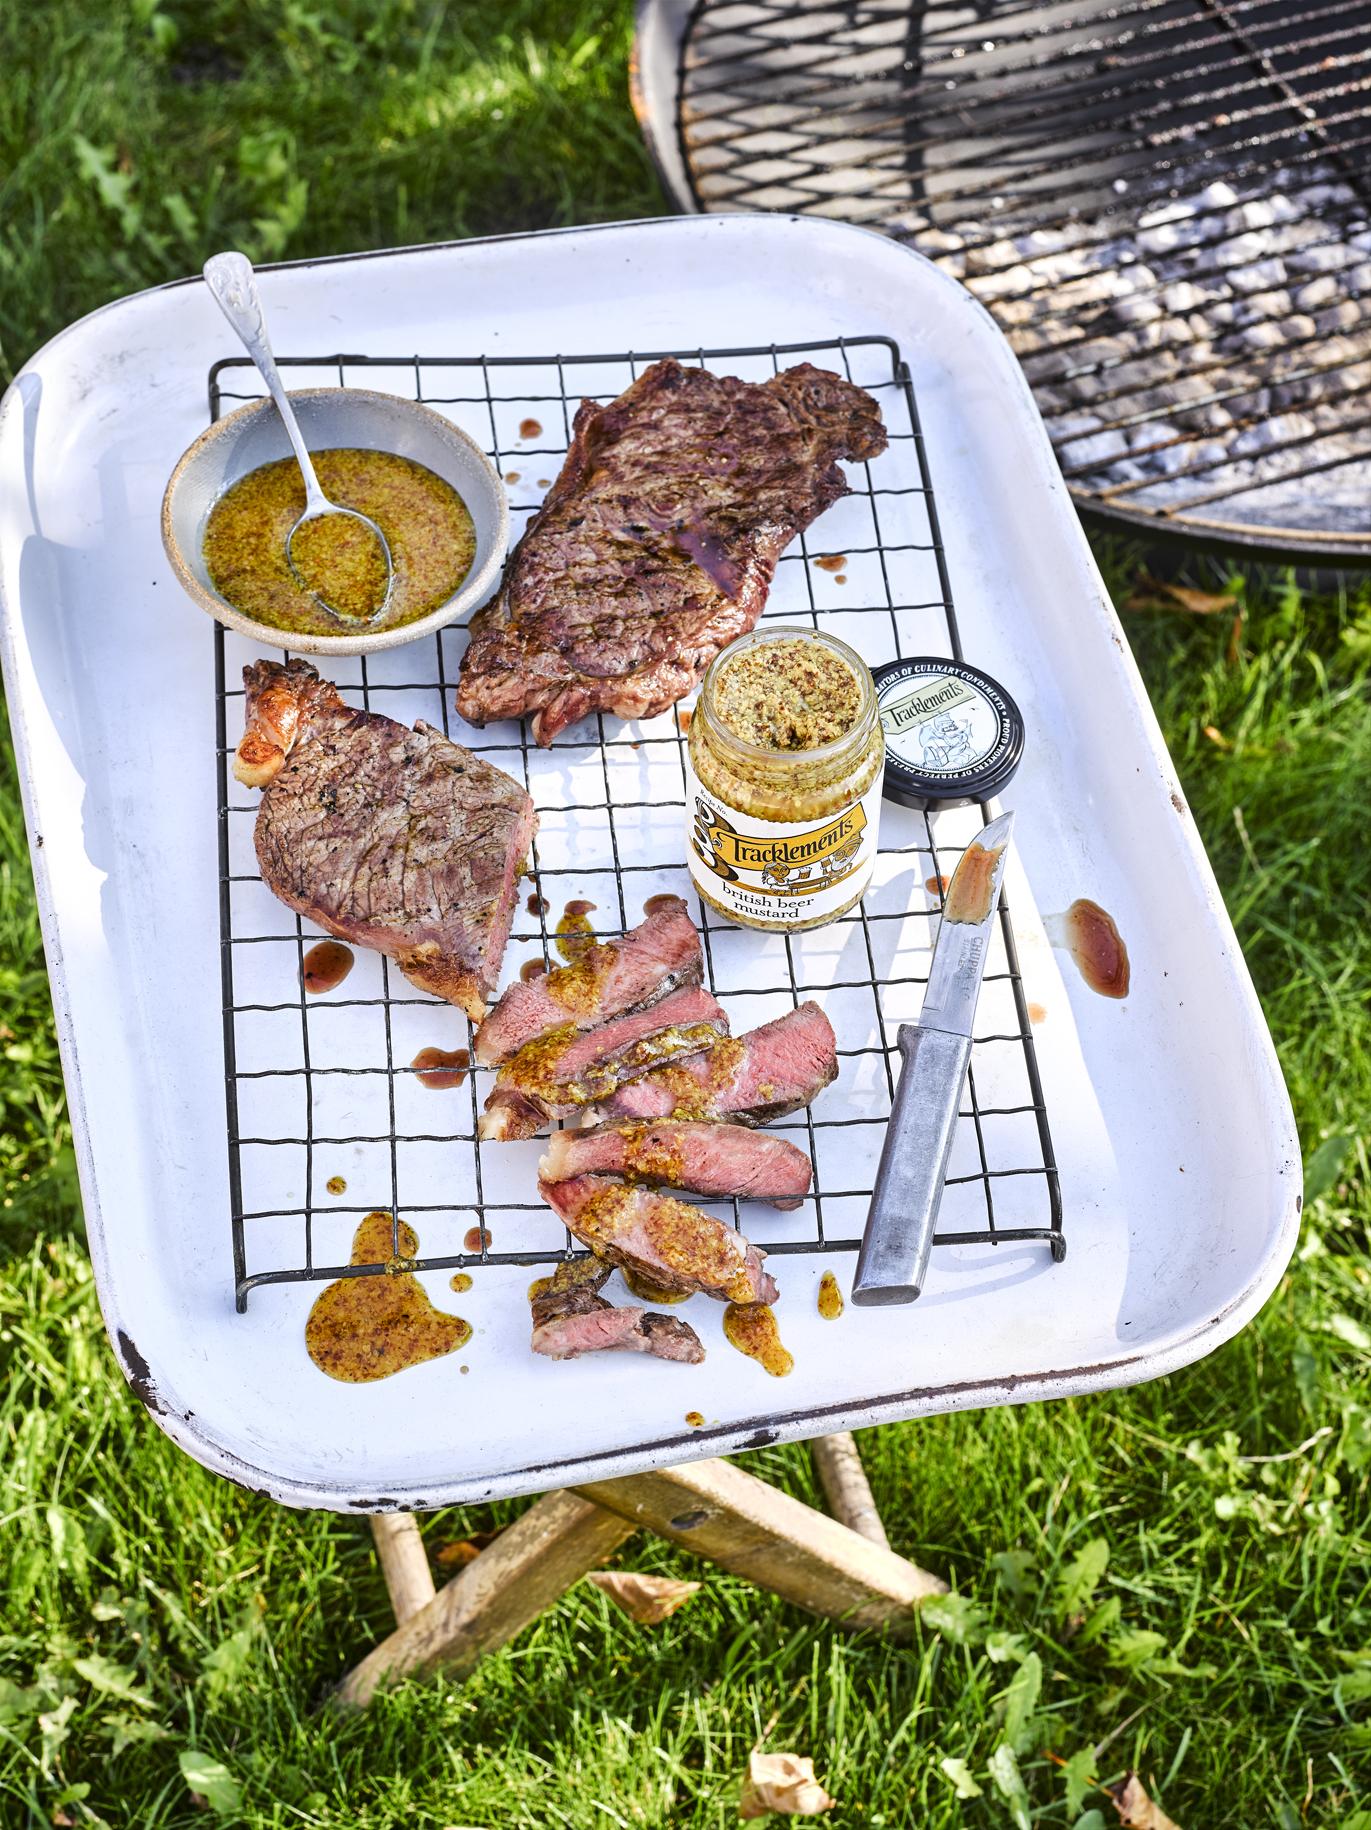 Barbecued Steak with British Beer Mustard Dressing